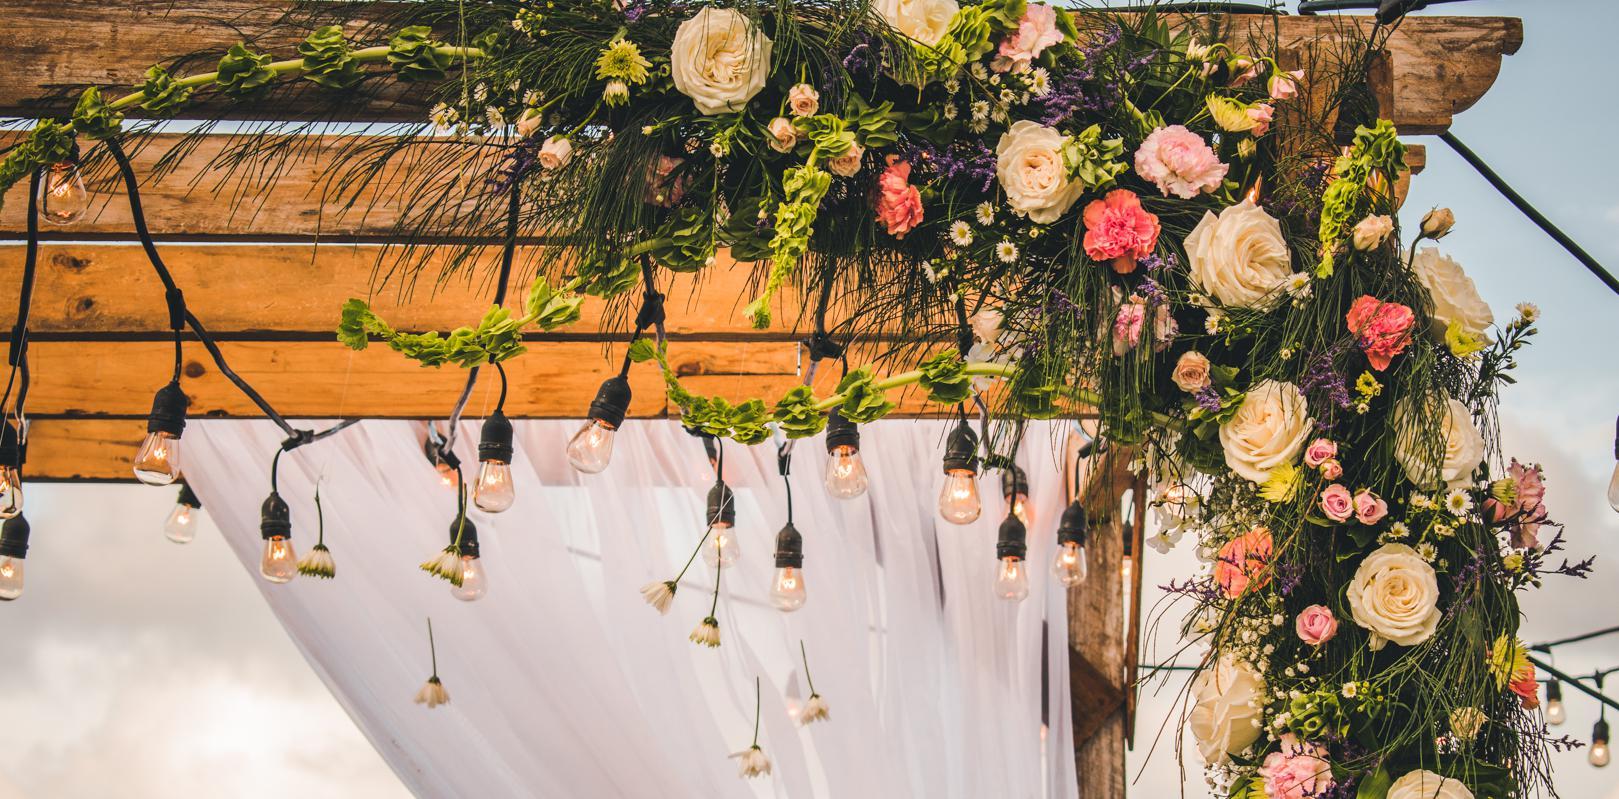 bodas-sin-clasificar-sin-tema-cuba-42452.jpg